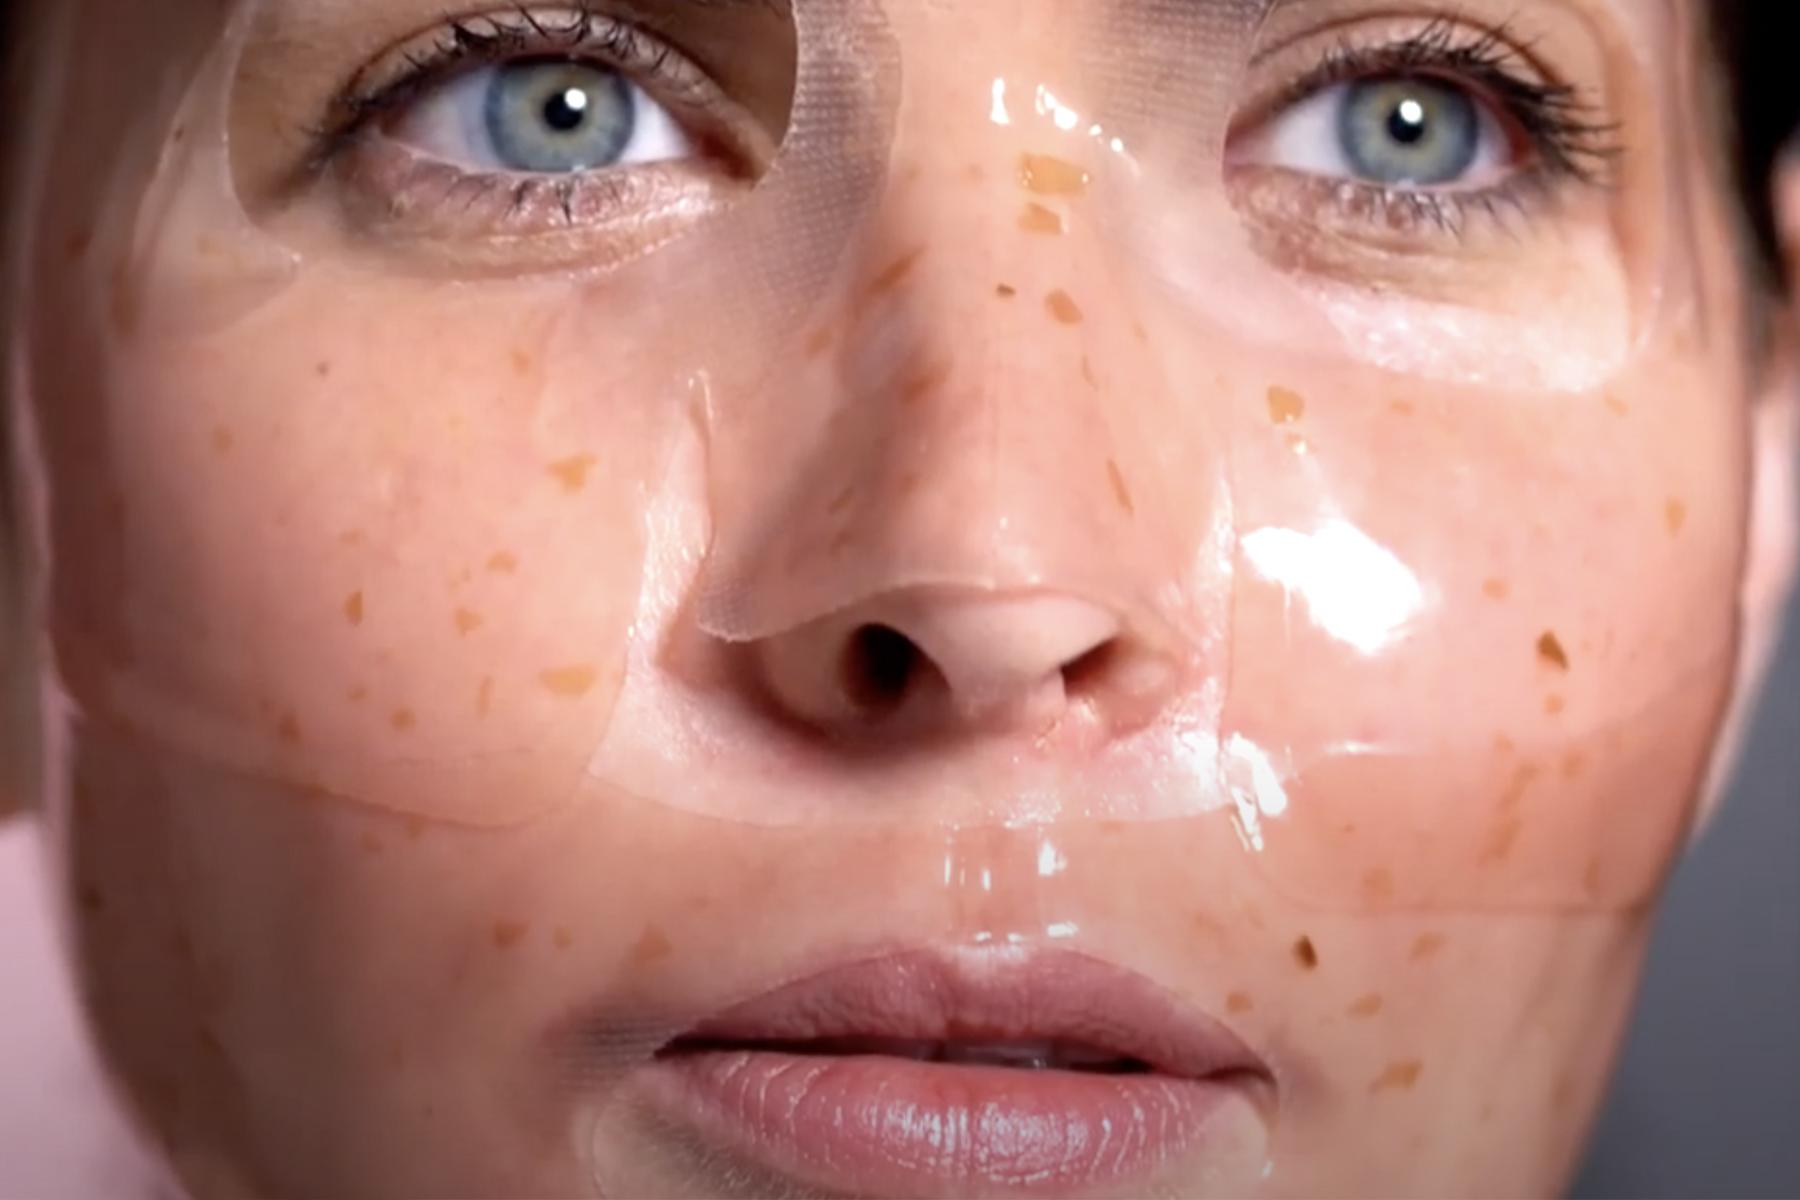 by terry baume de rose masque patch visage test